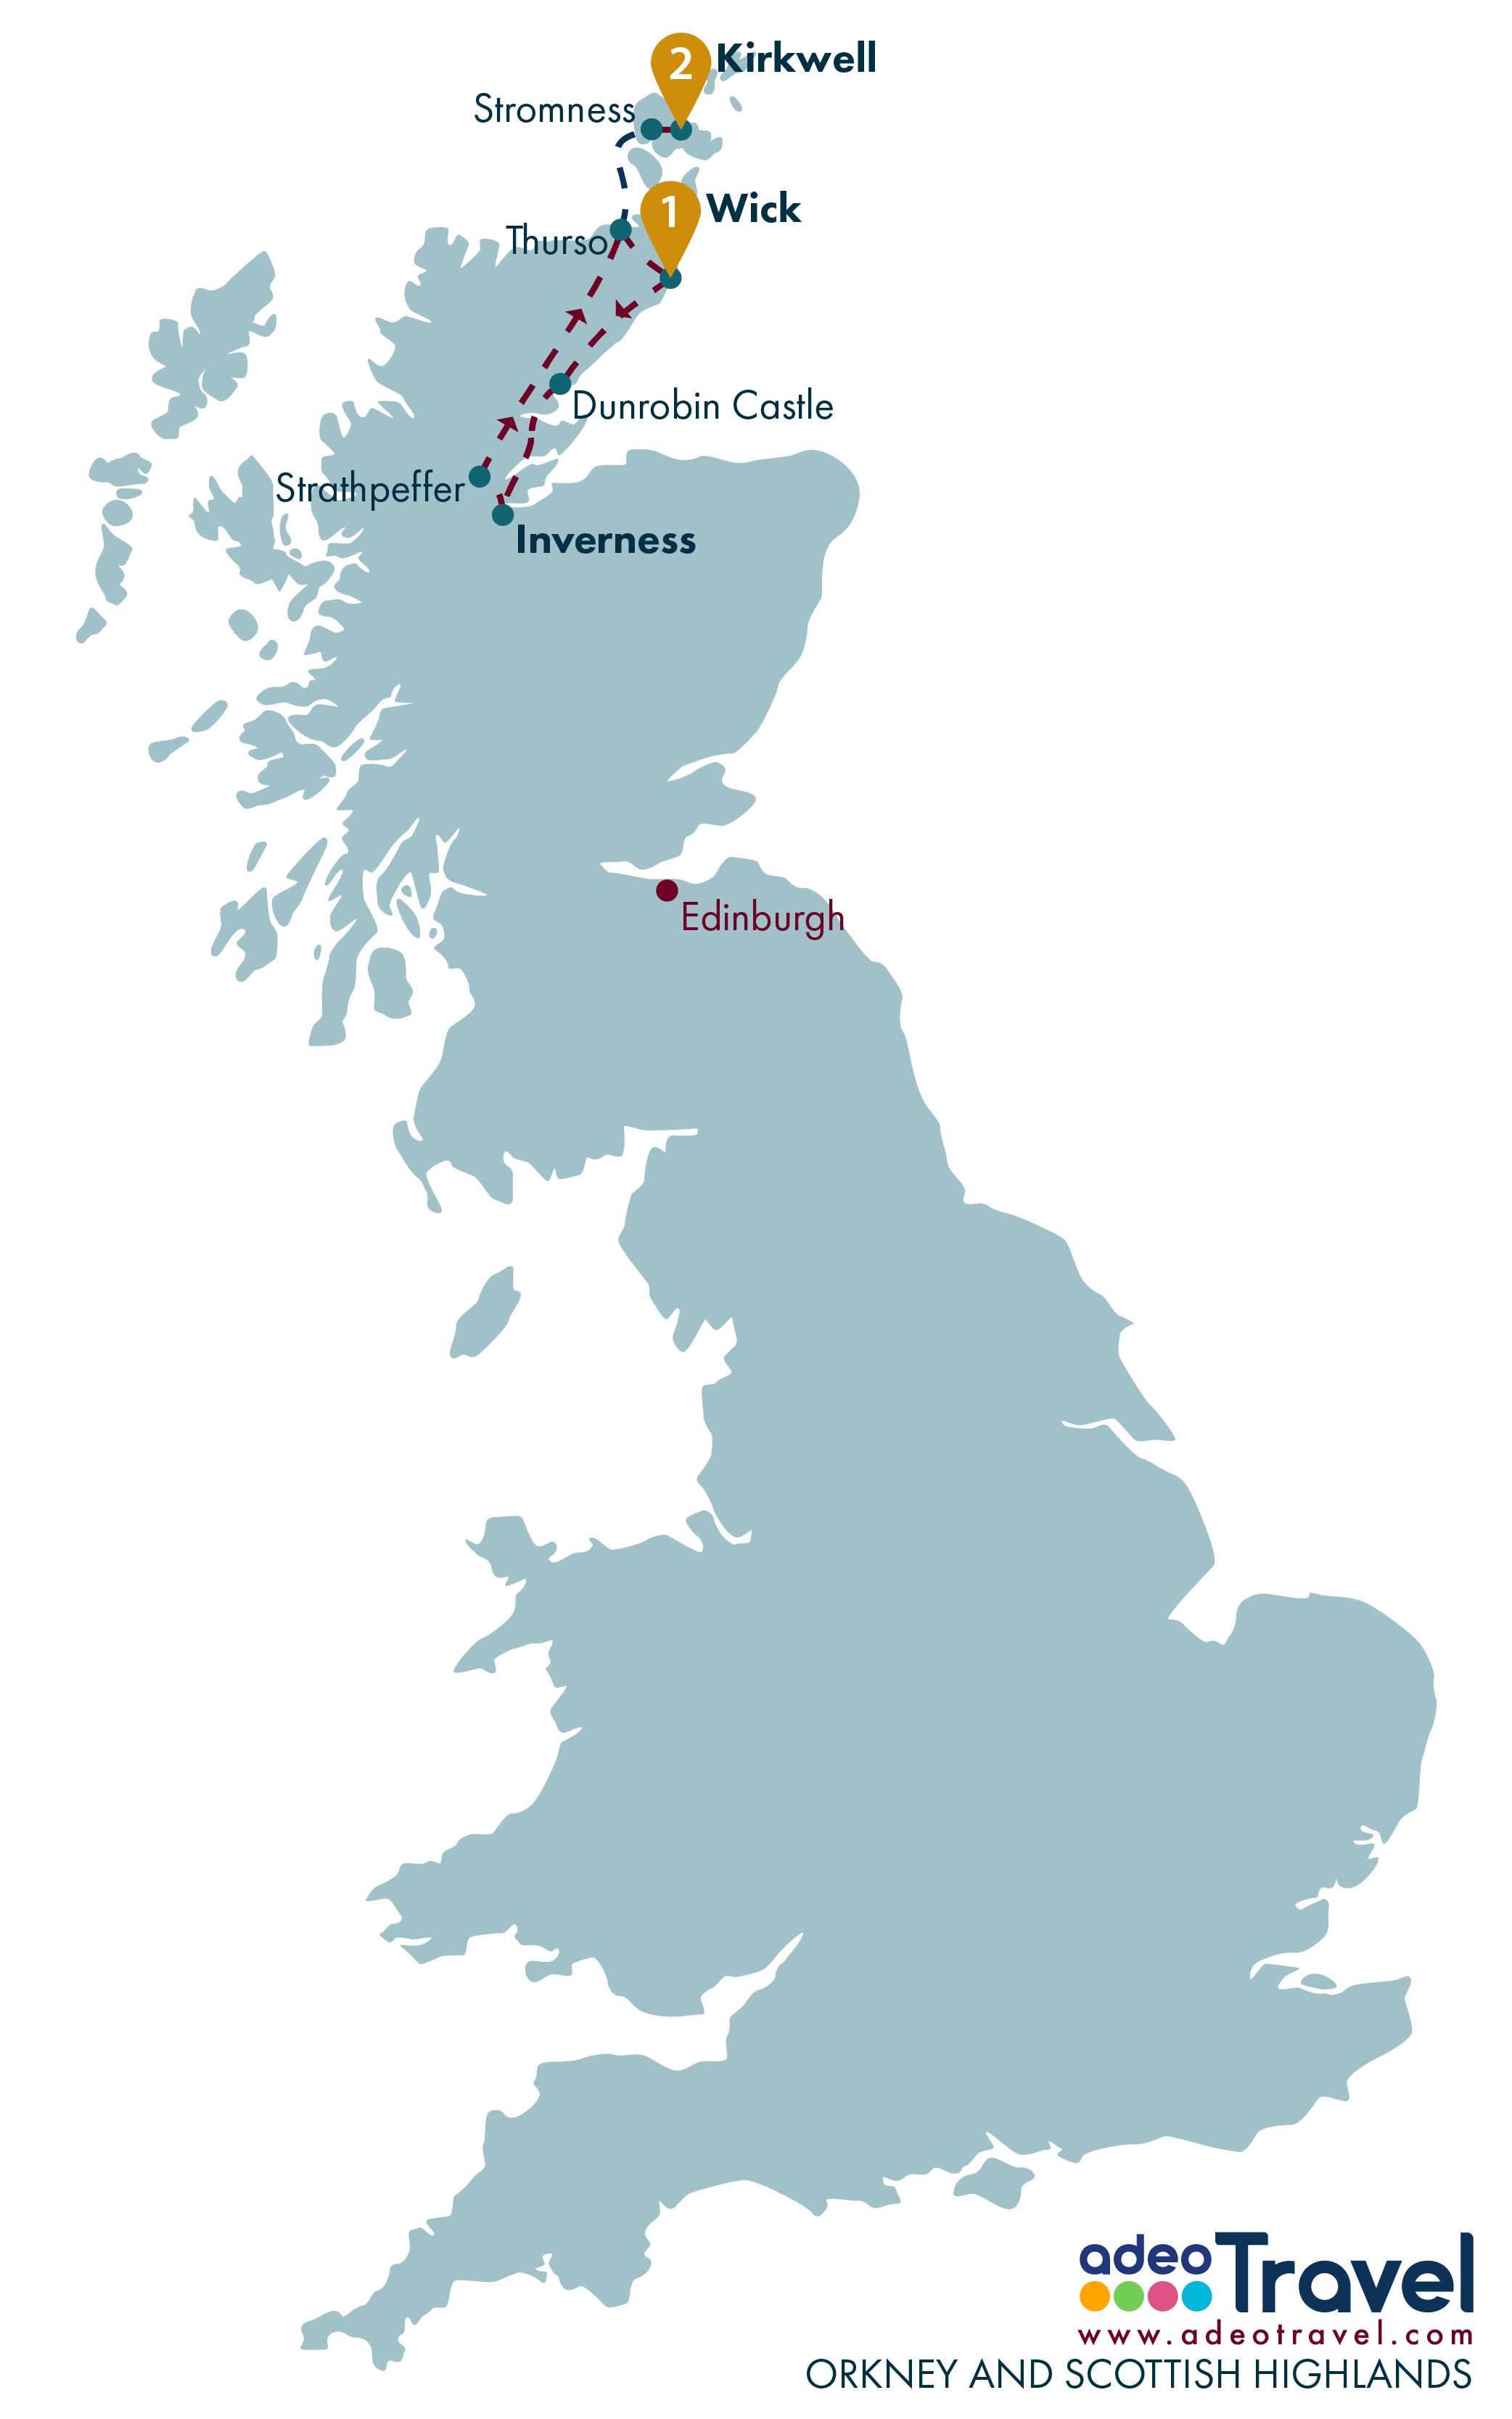 Tour Map - Orkneys and Scottish Highlands